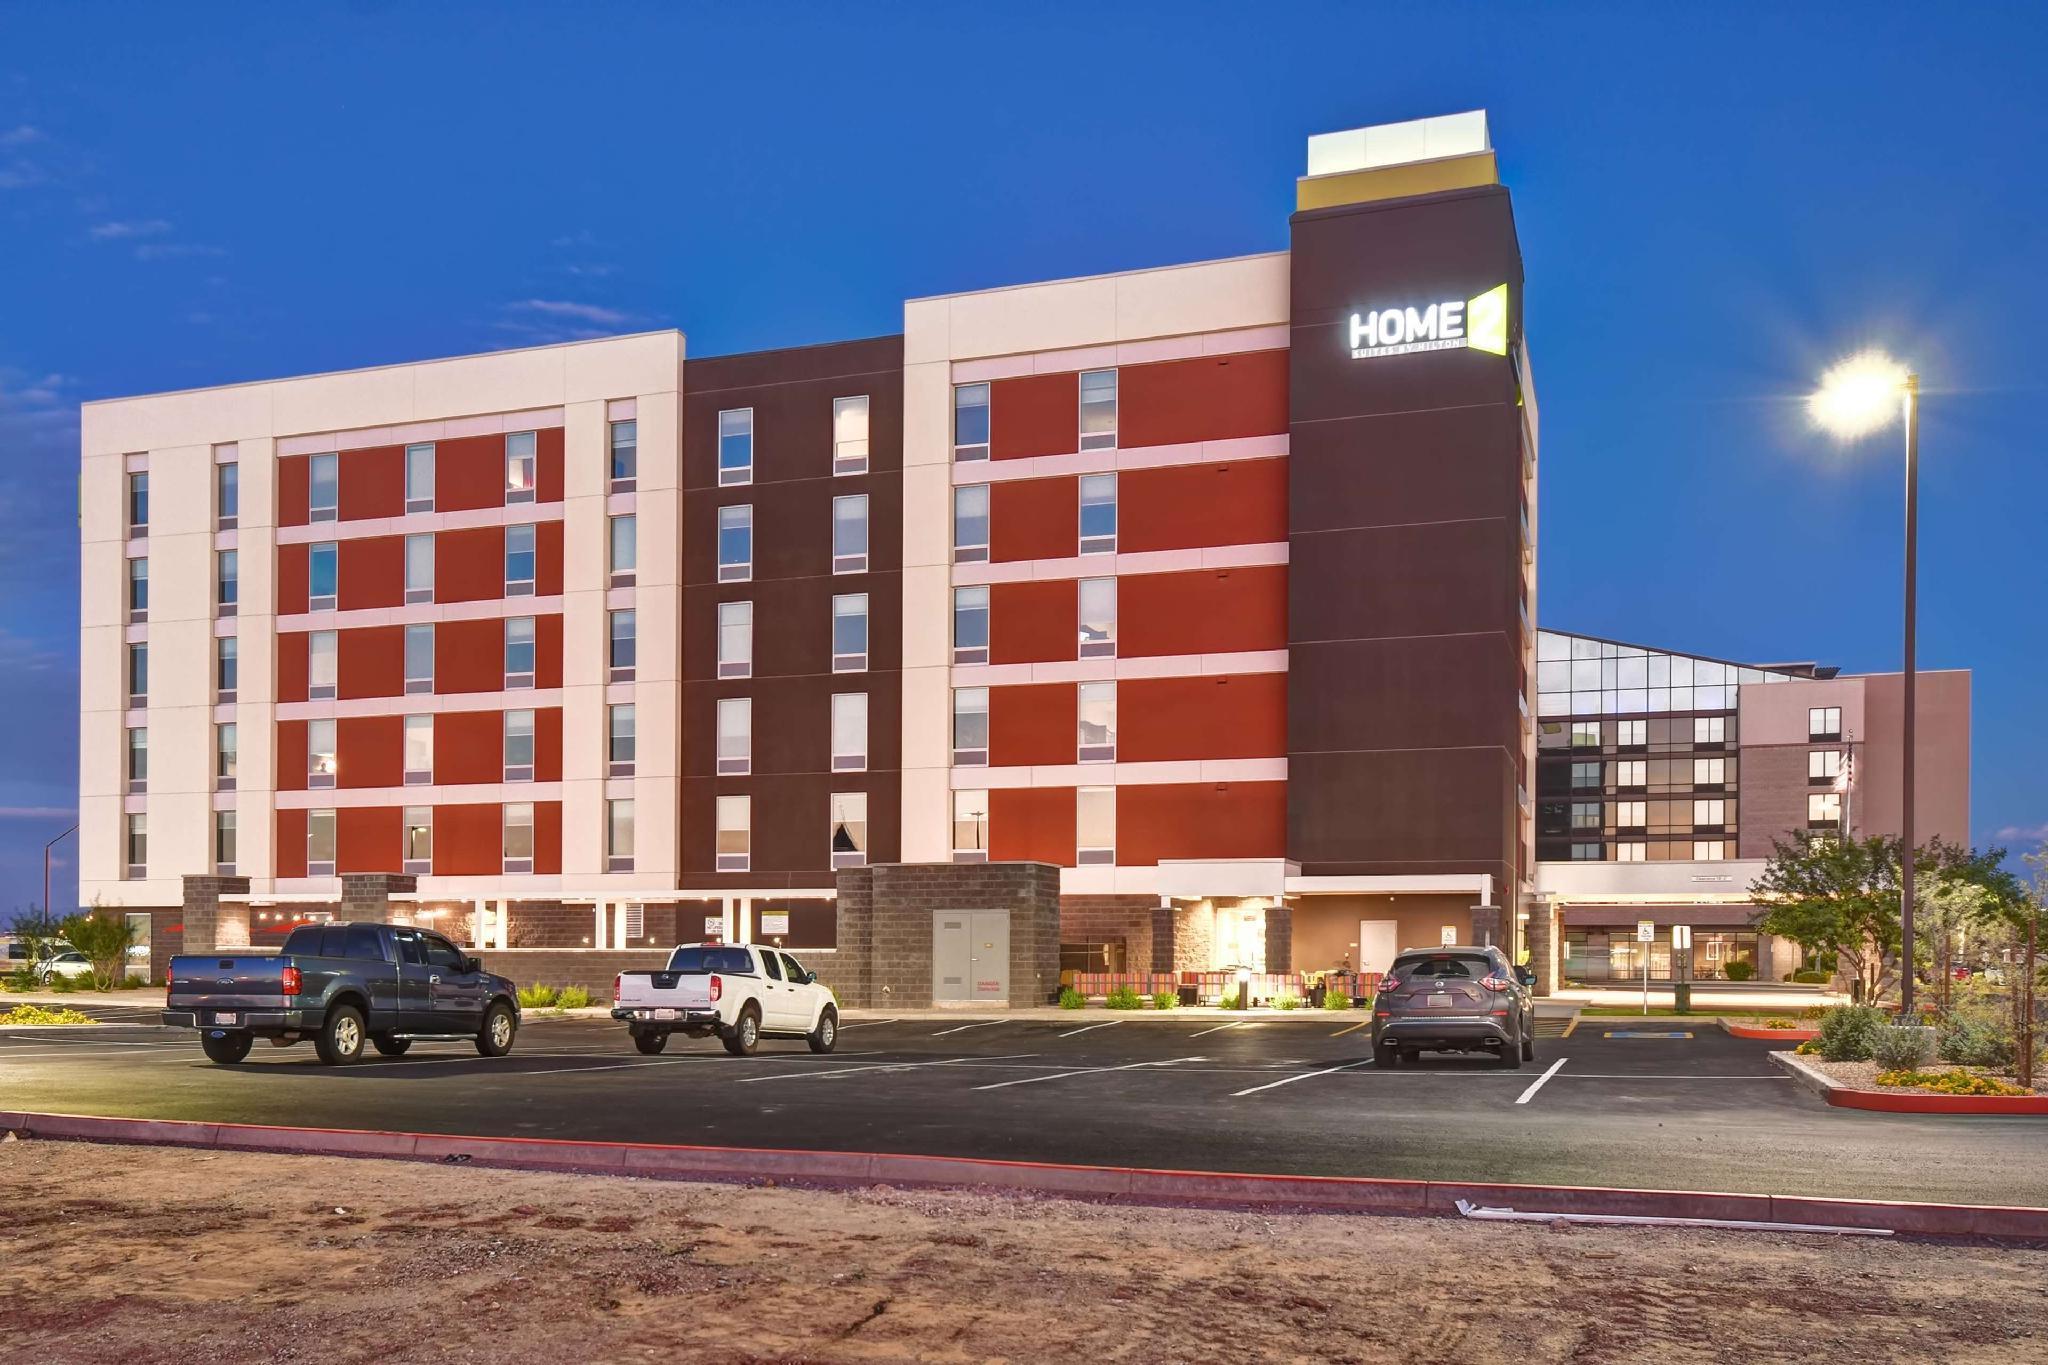 Home2 Suites By Hilton Gilbert AZ